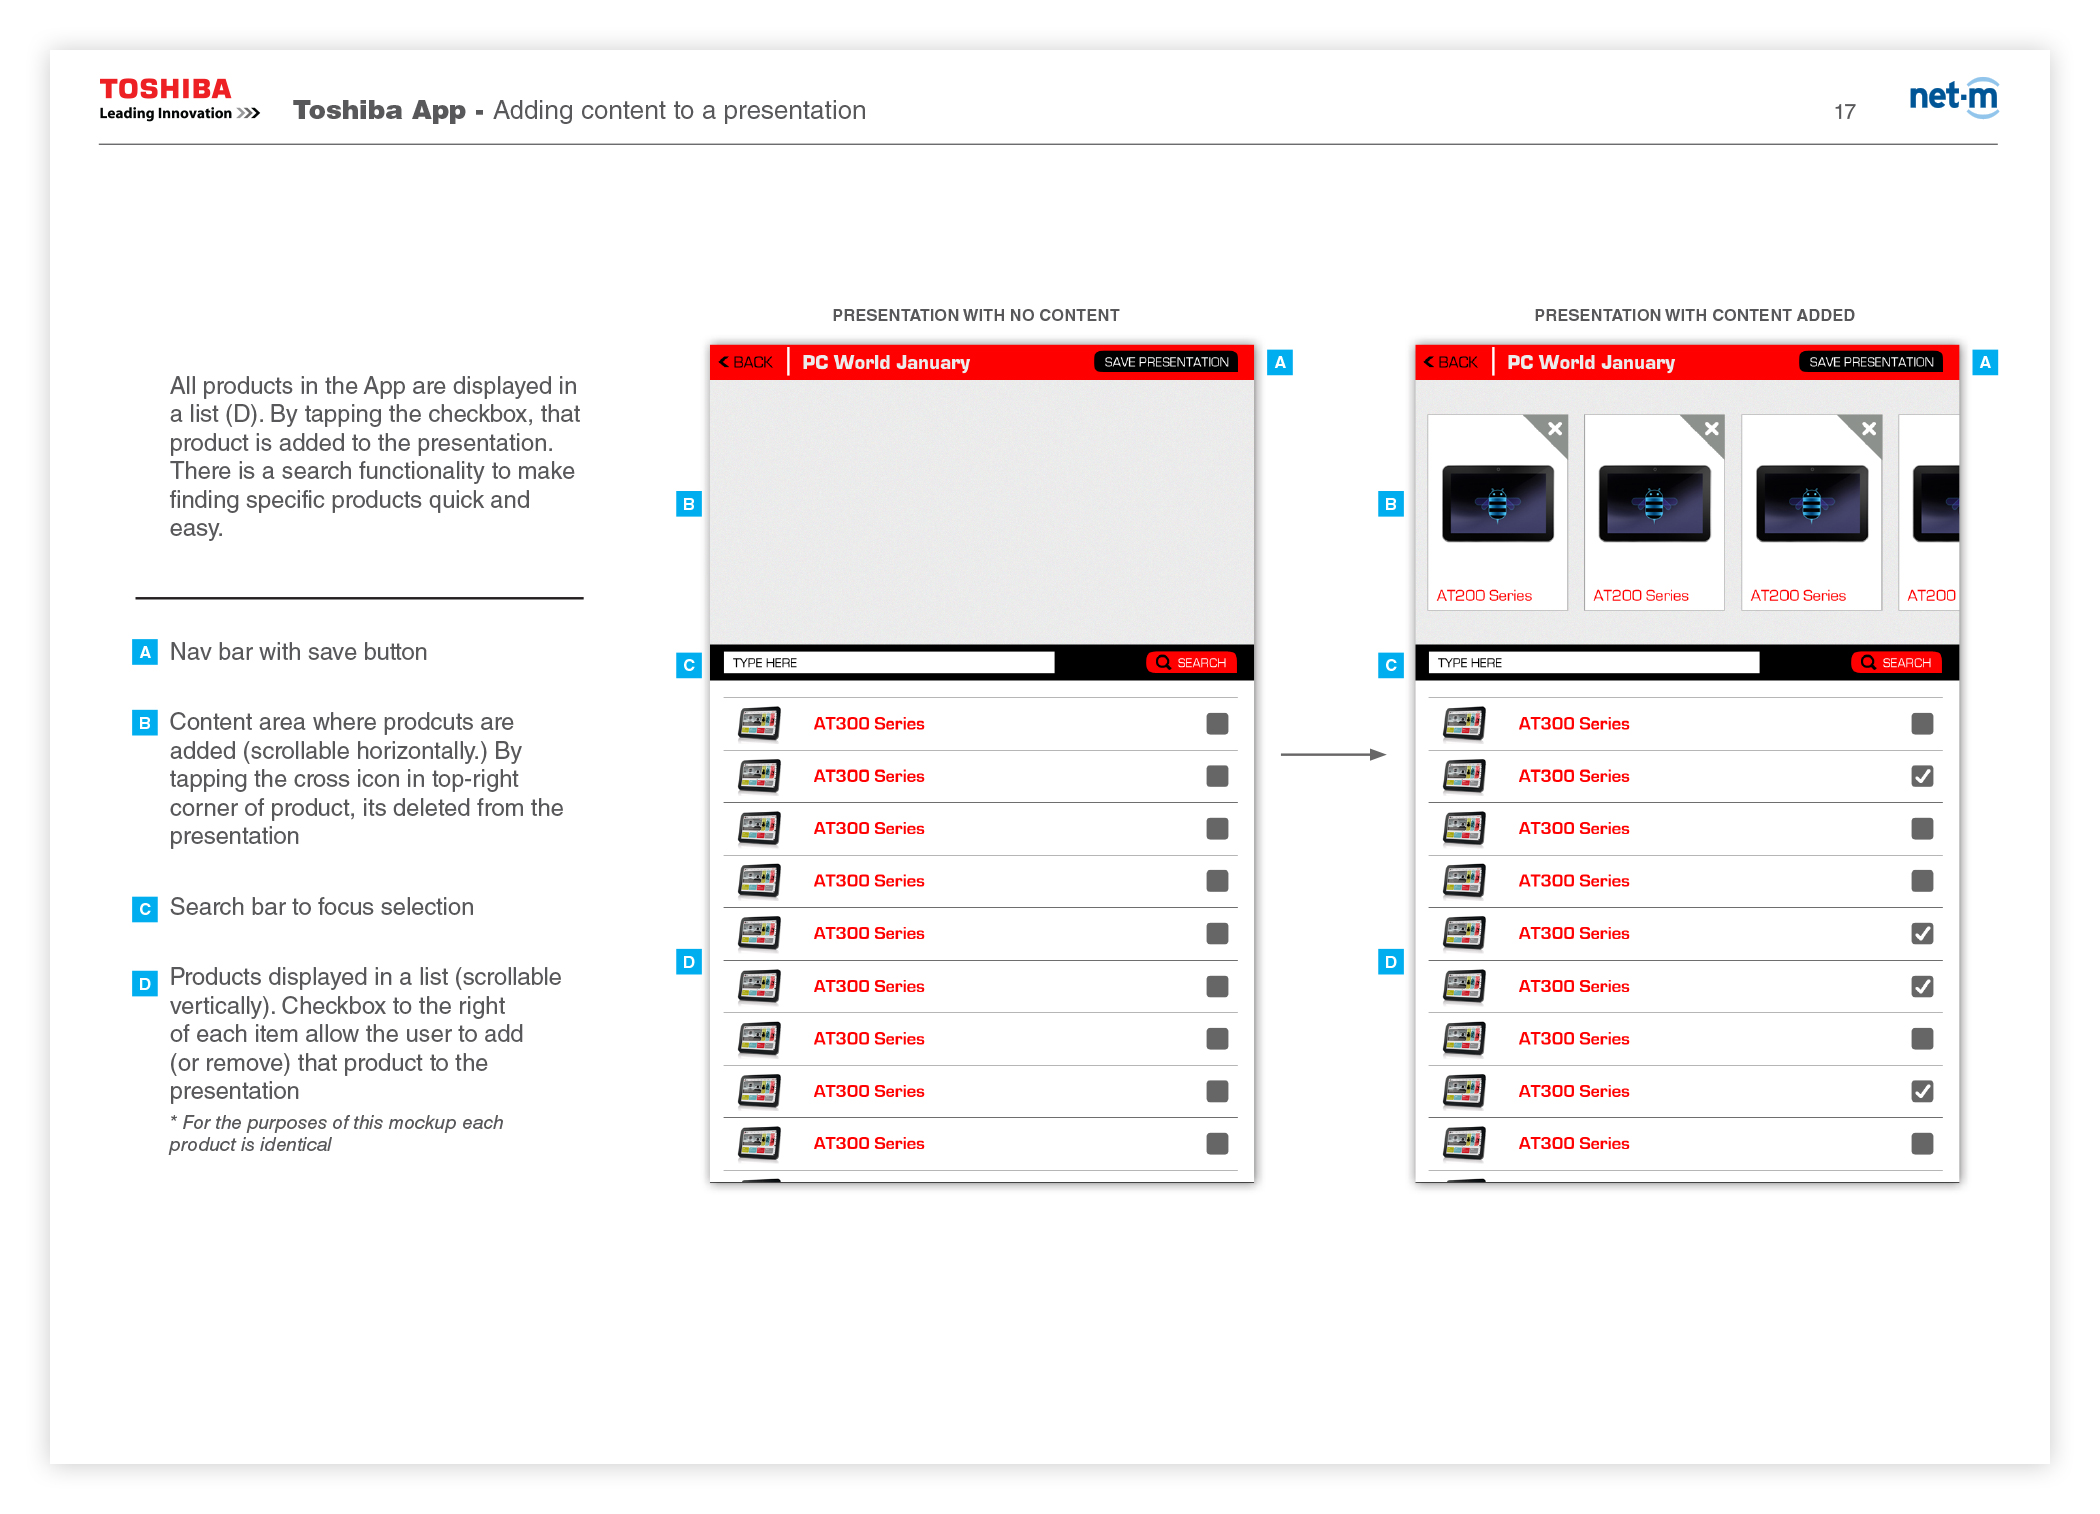 Toshiba_App_presentation_deck9.jpg